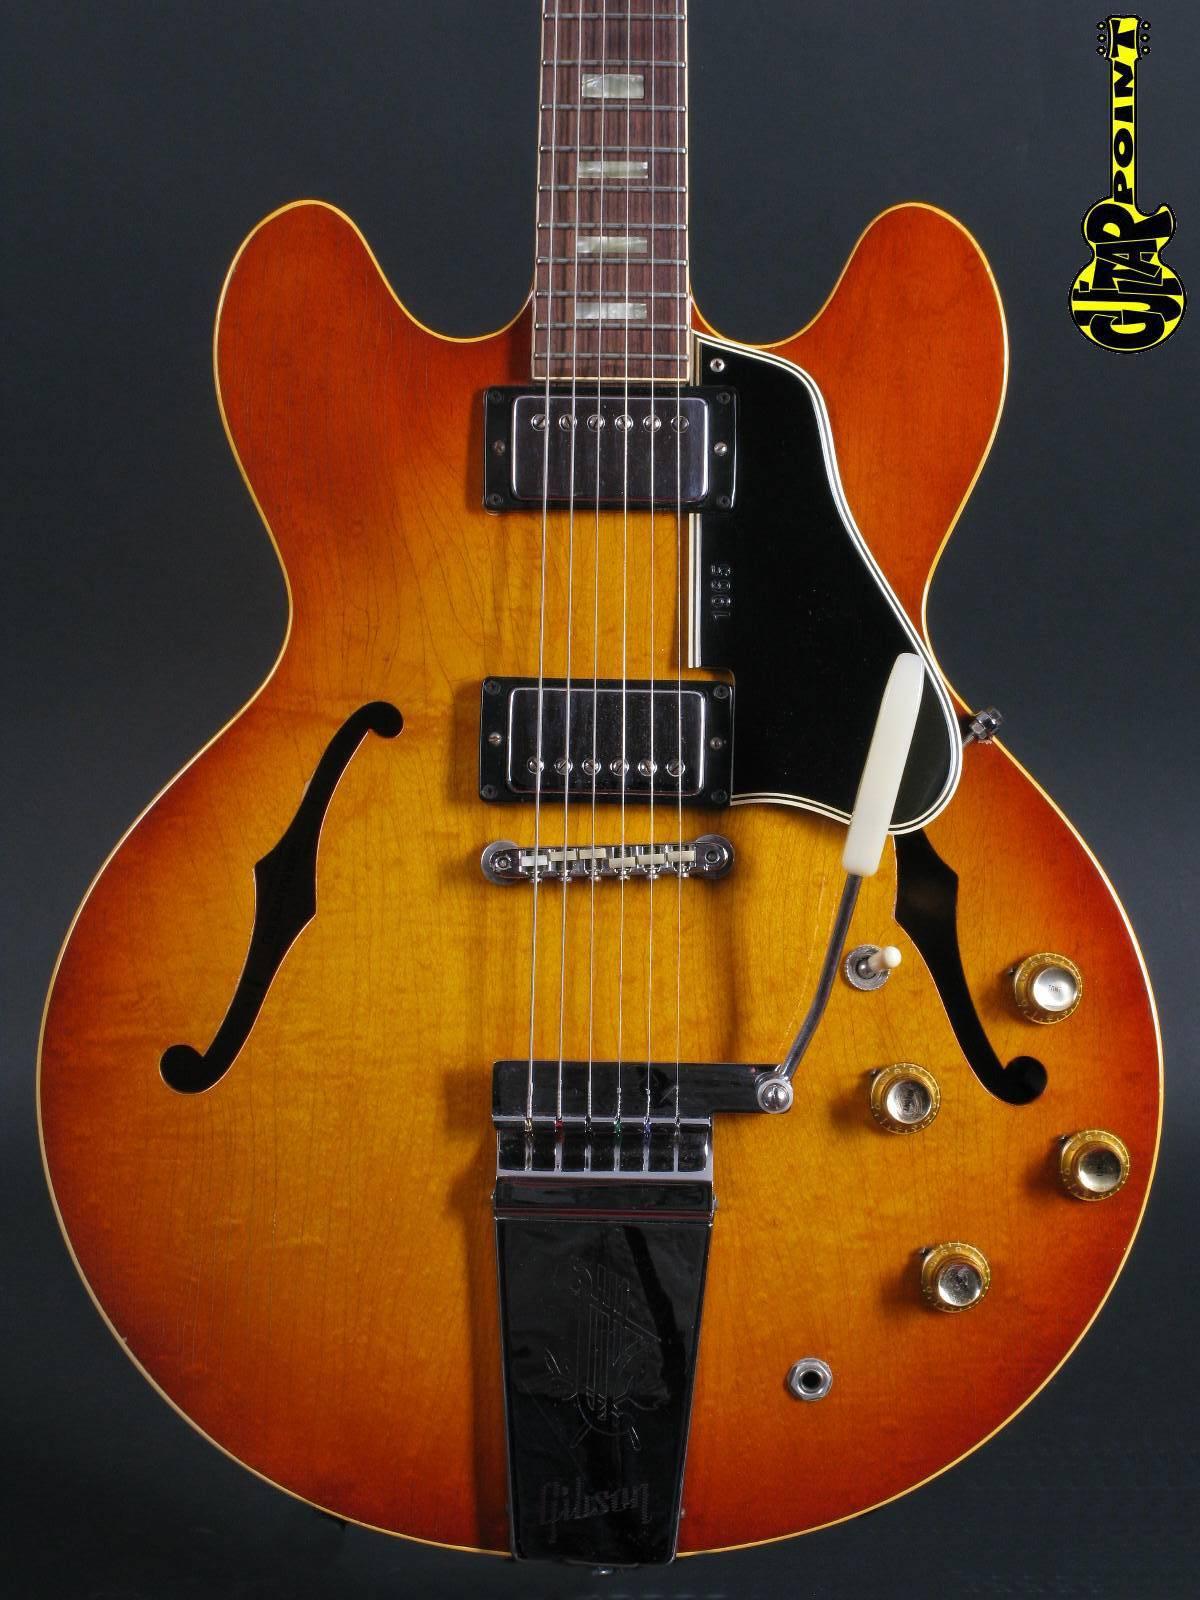 1965 Gibson ES-335 Sunburst / Maestro Trem